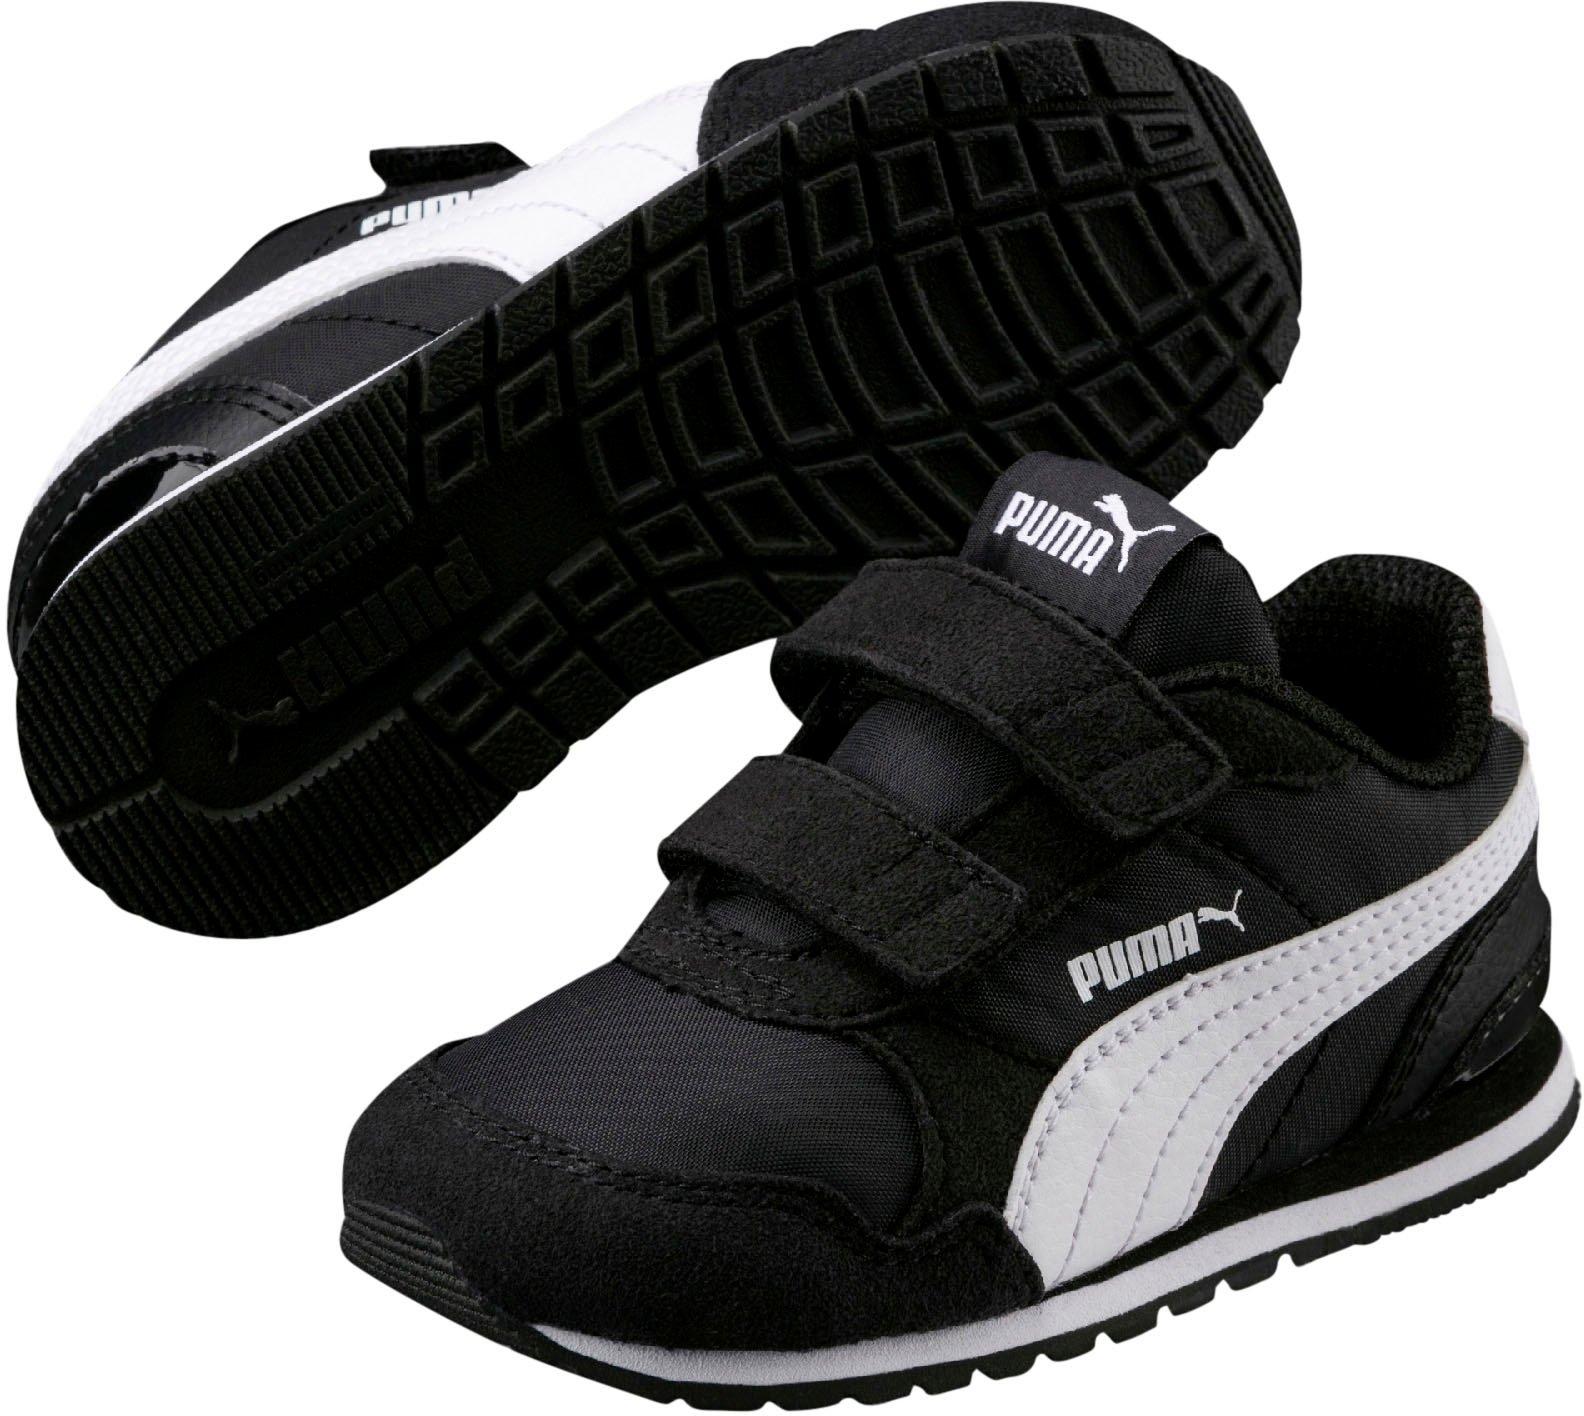 PUMA sneakers ST Runner v2 NL V PS nu online bestellen